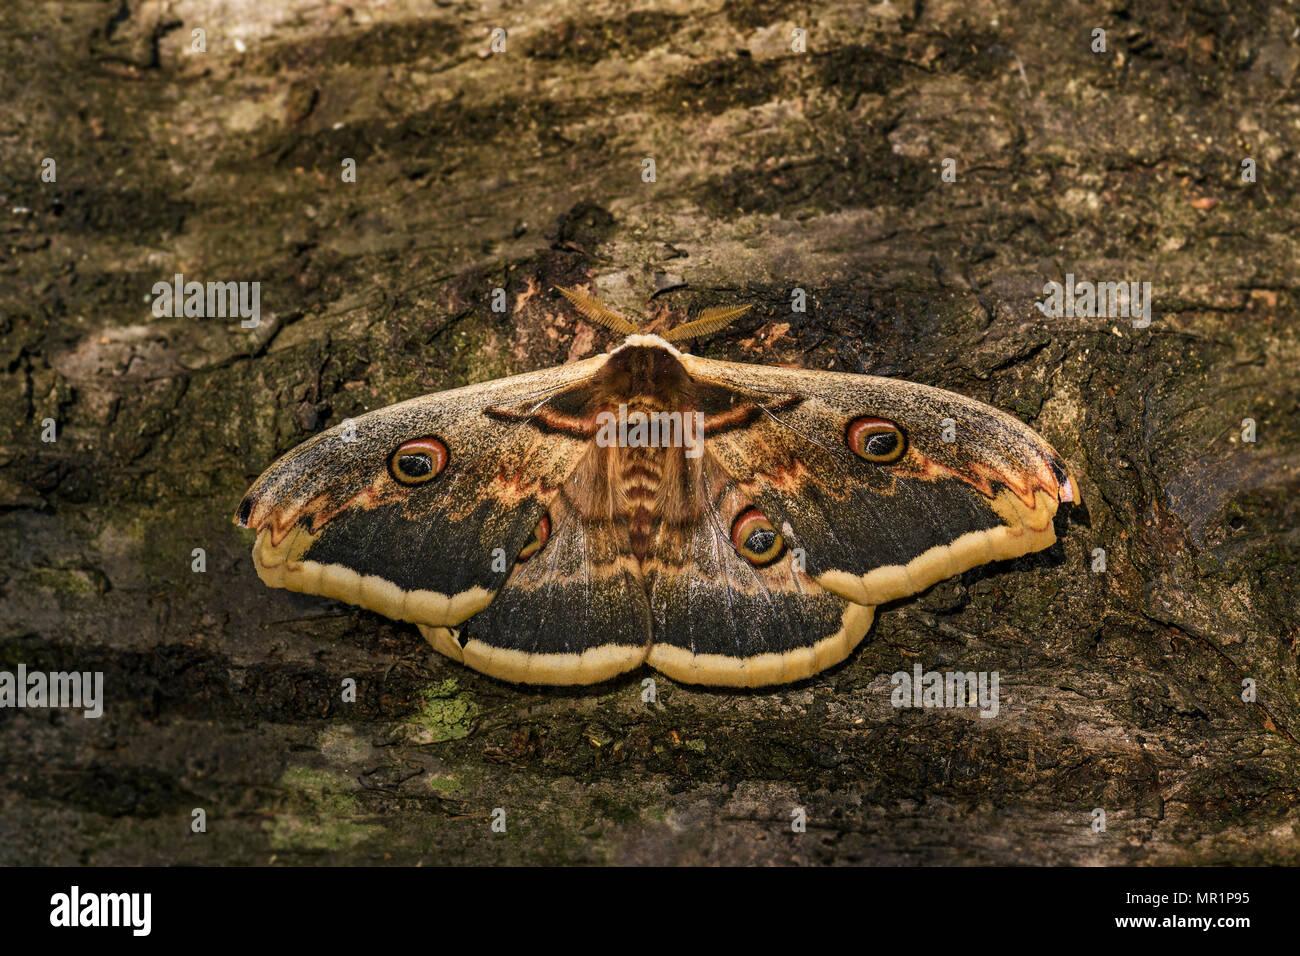 Great Peacock Moth - Saturnia pyri, beautiful large moth from Europe, Czech Republic. Stock Photo